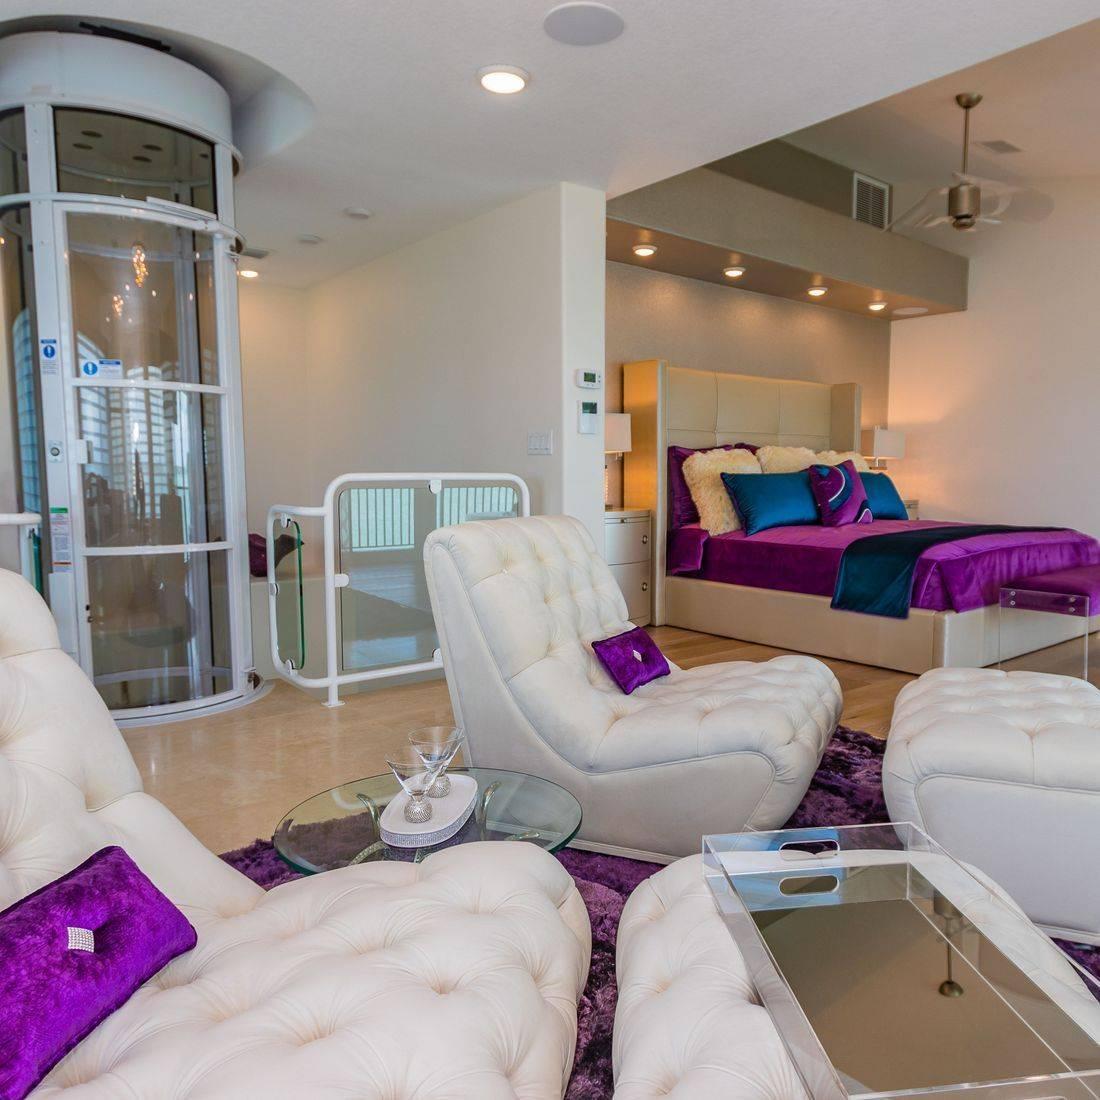 Master Suite, Purple bedding